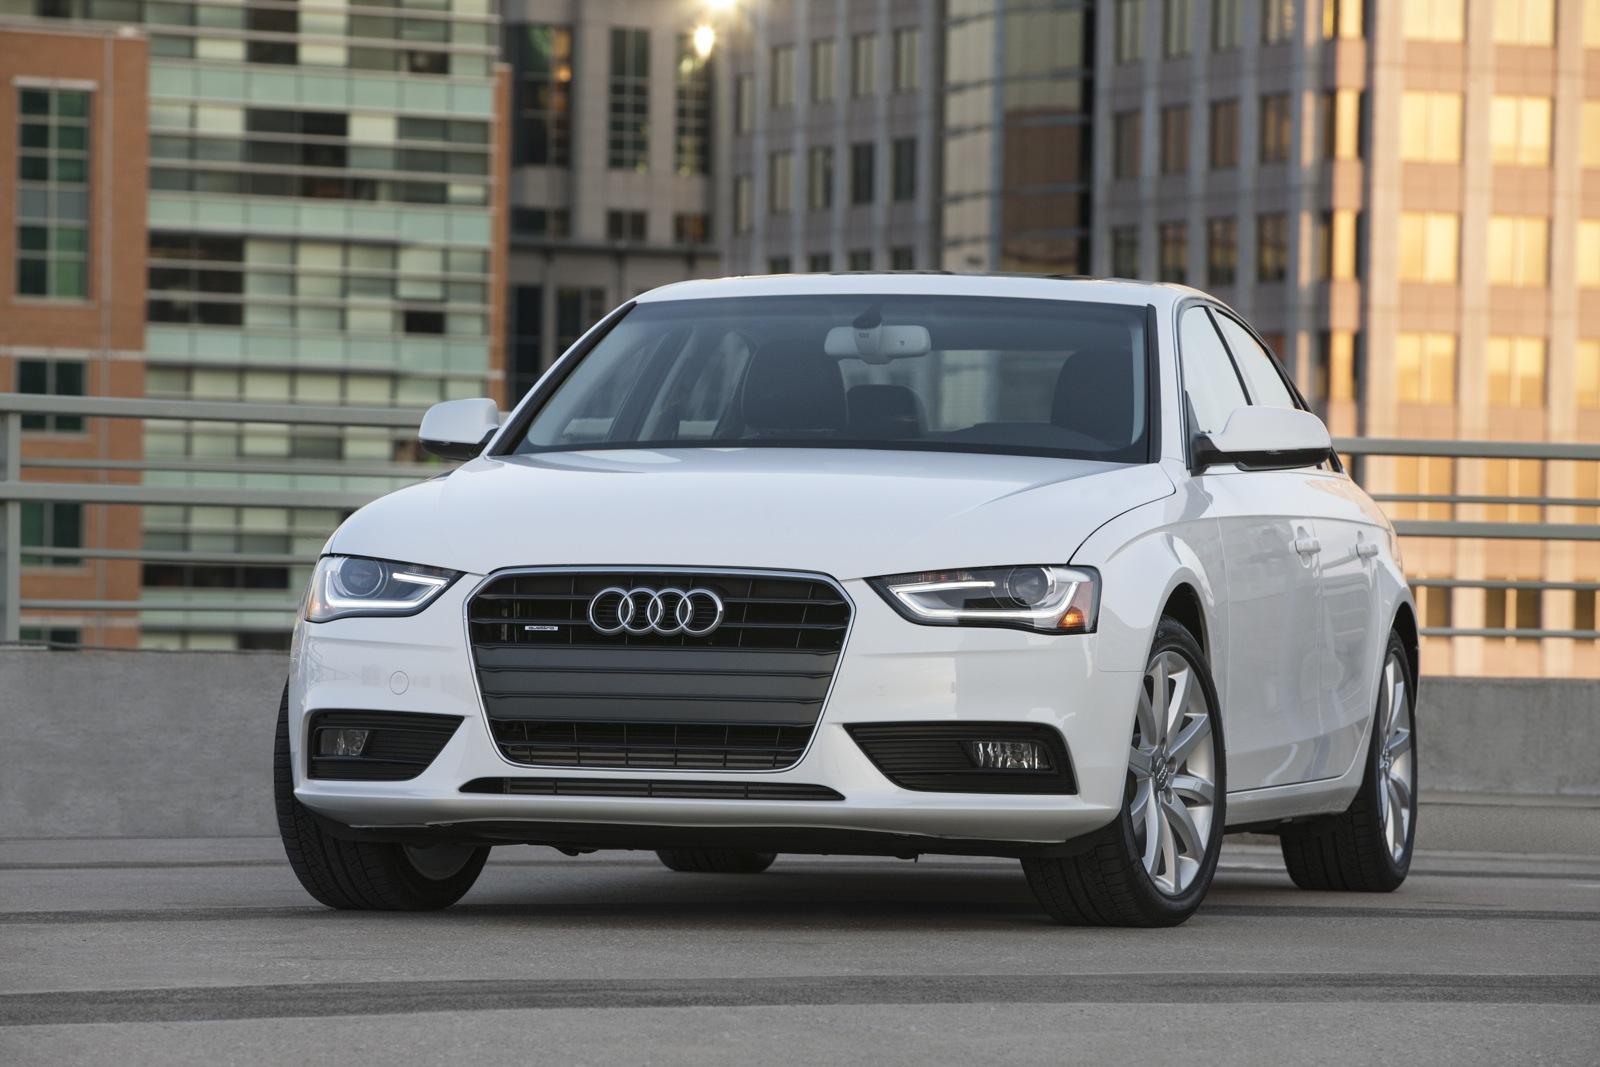 Audi A To Get ETron Version Electric AWD Quattro Too - Audi circle